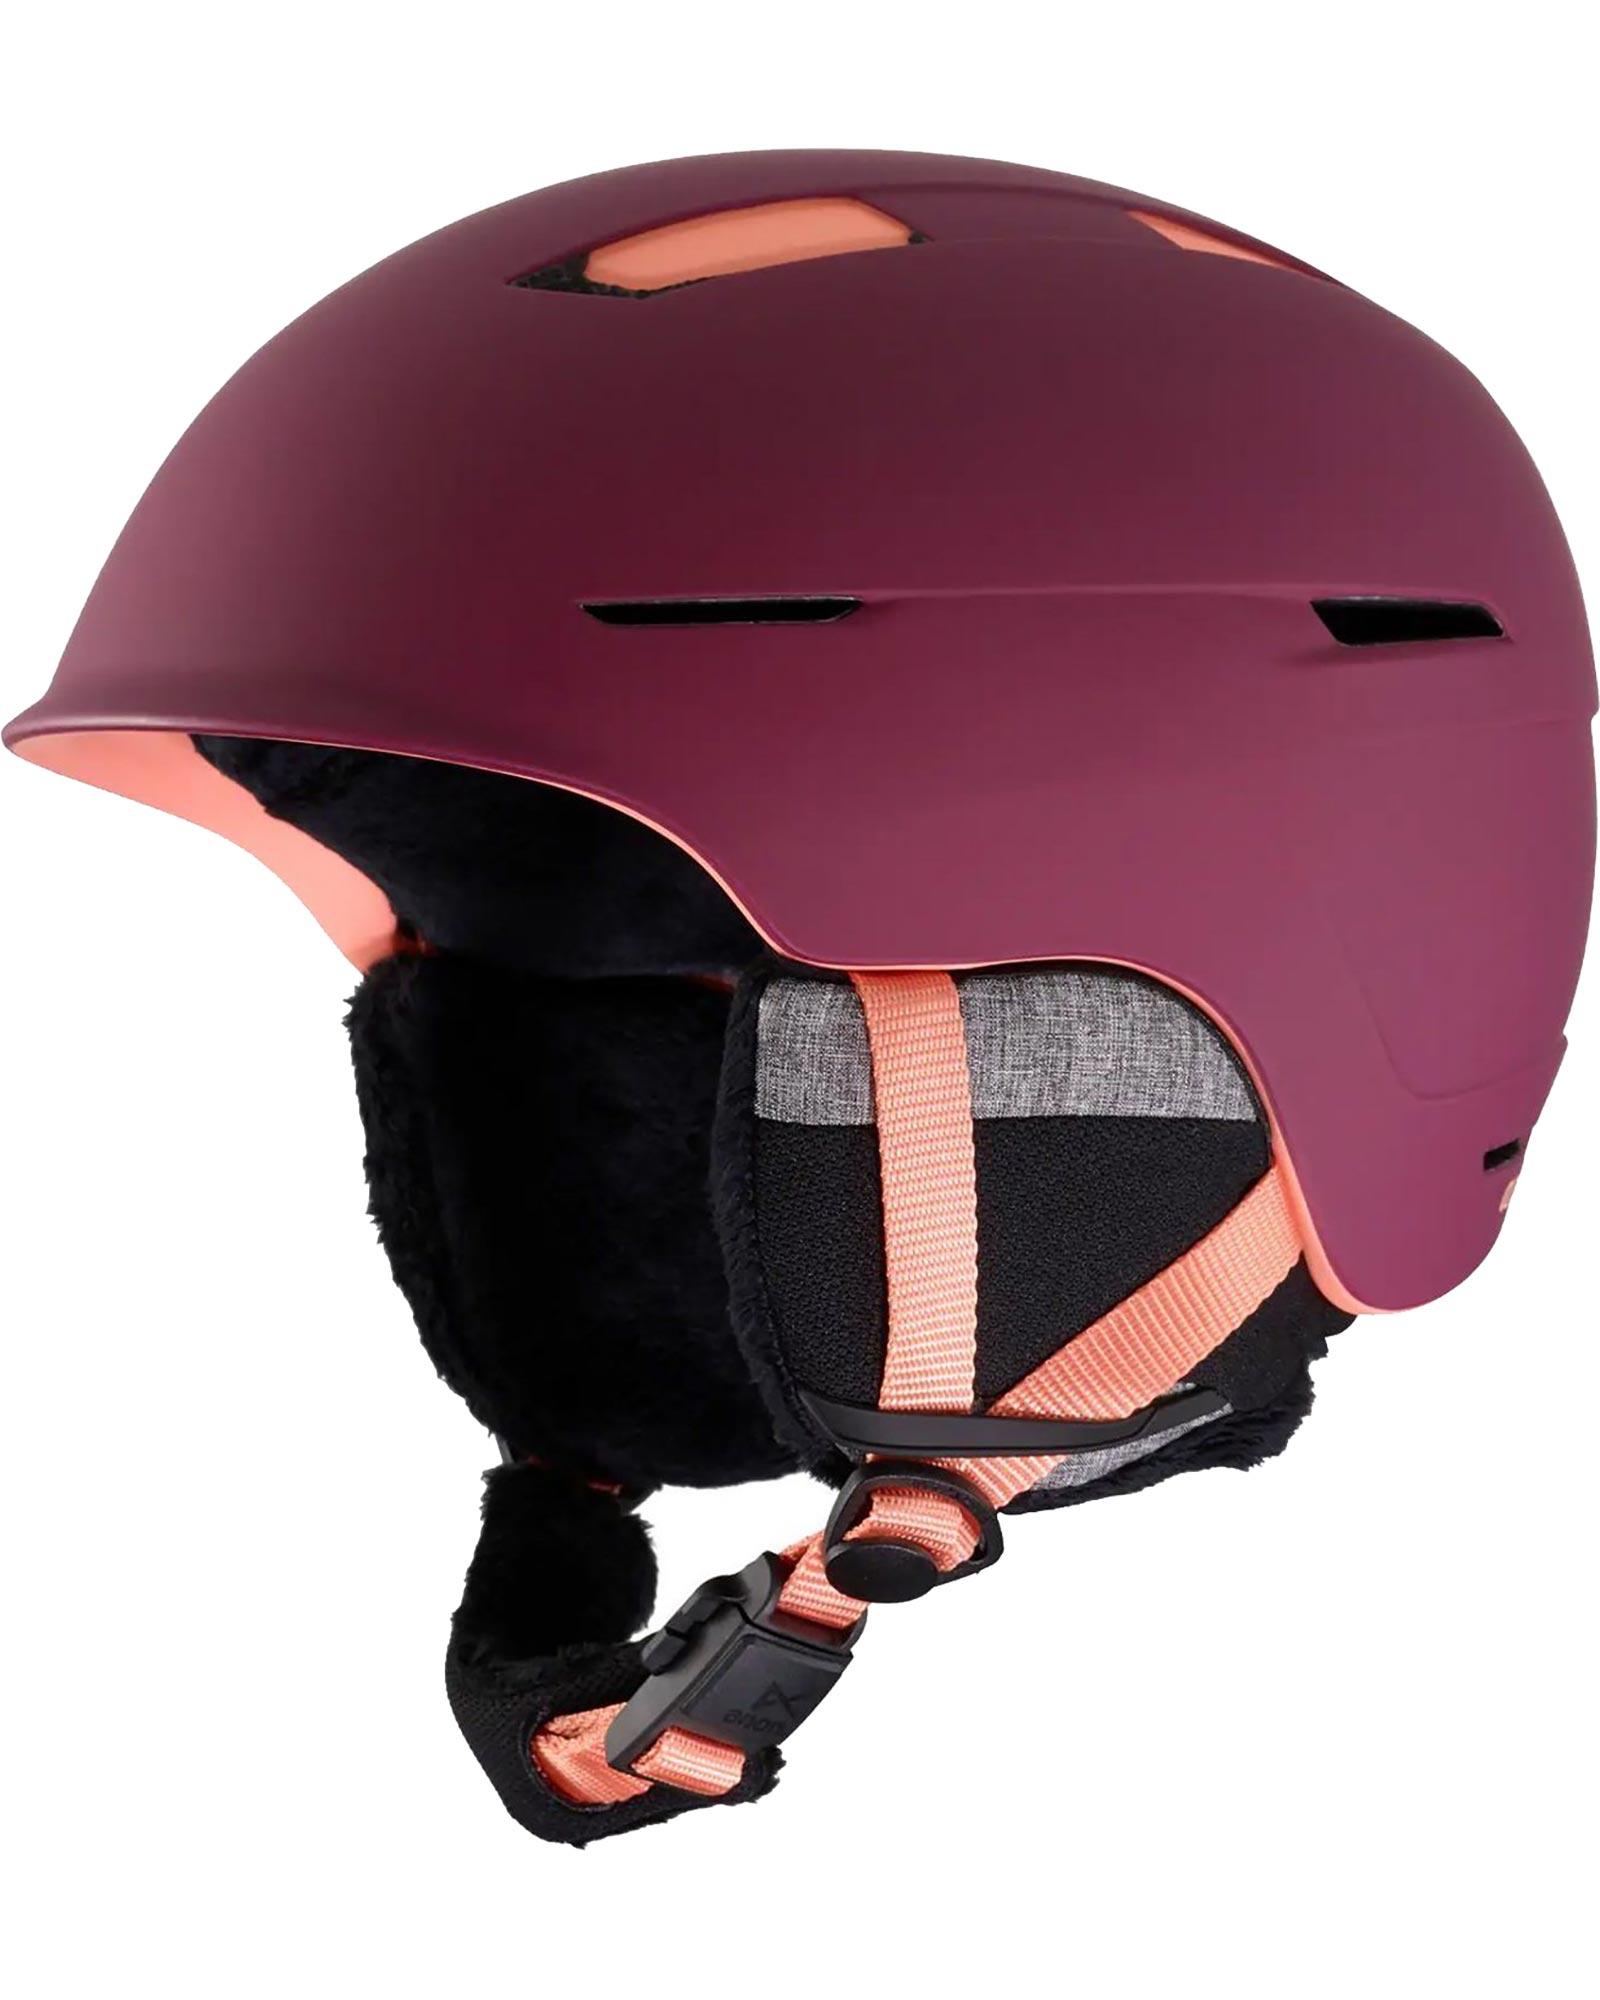 Anon Women's Aubern Ski/Snowboard Helmet 2019 0